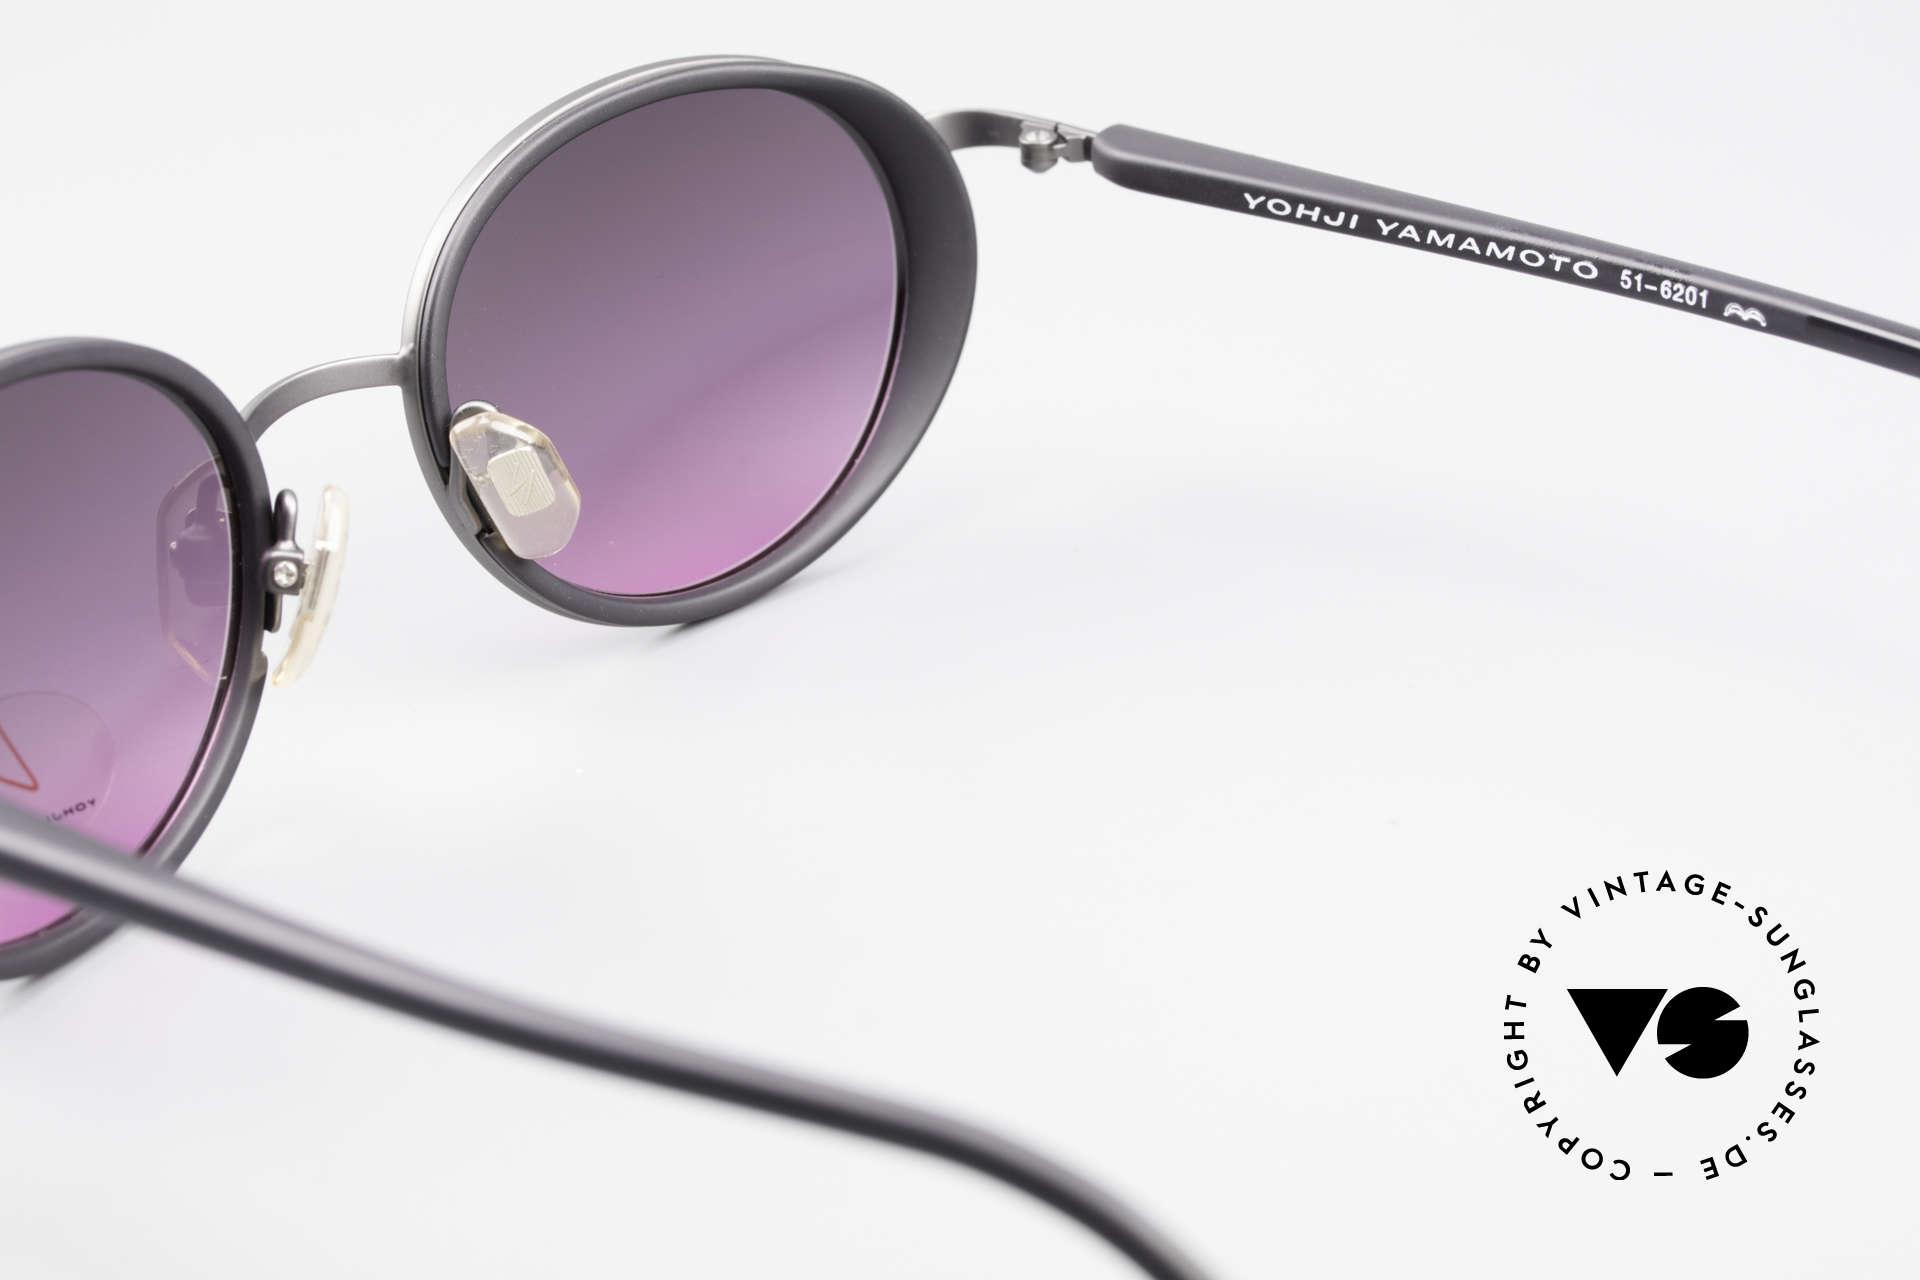 Yohji Yamamoto 51-6201 Side Shields Sunglasses 90's, Size: medium, Made for Women